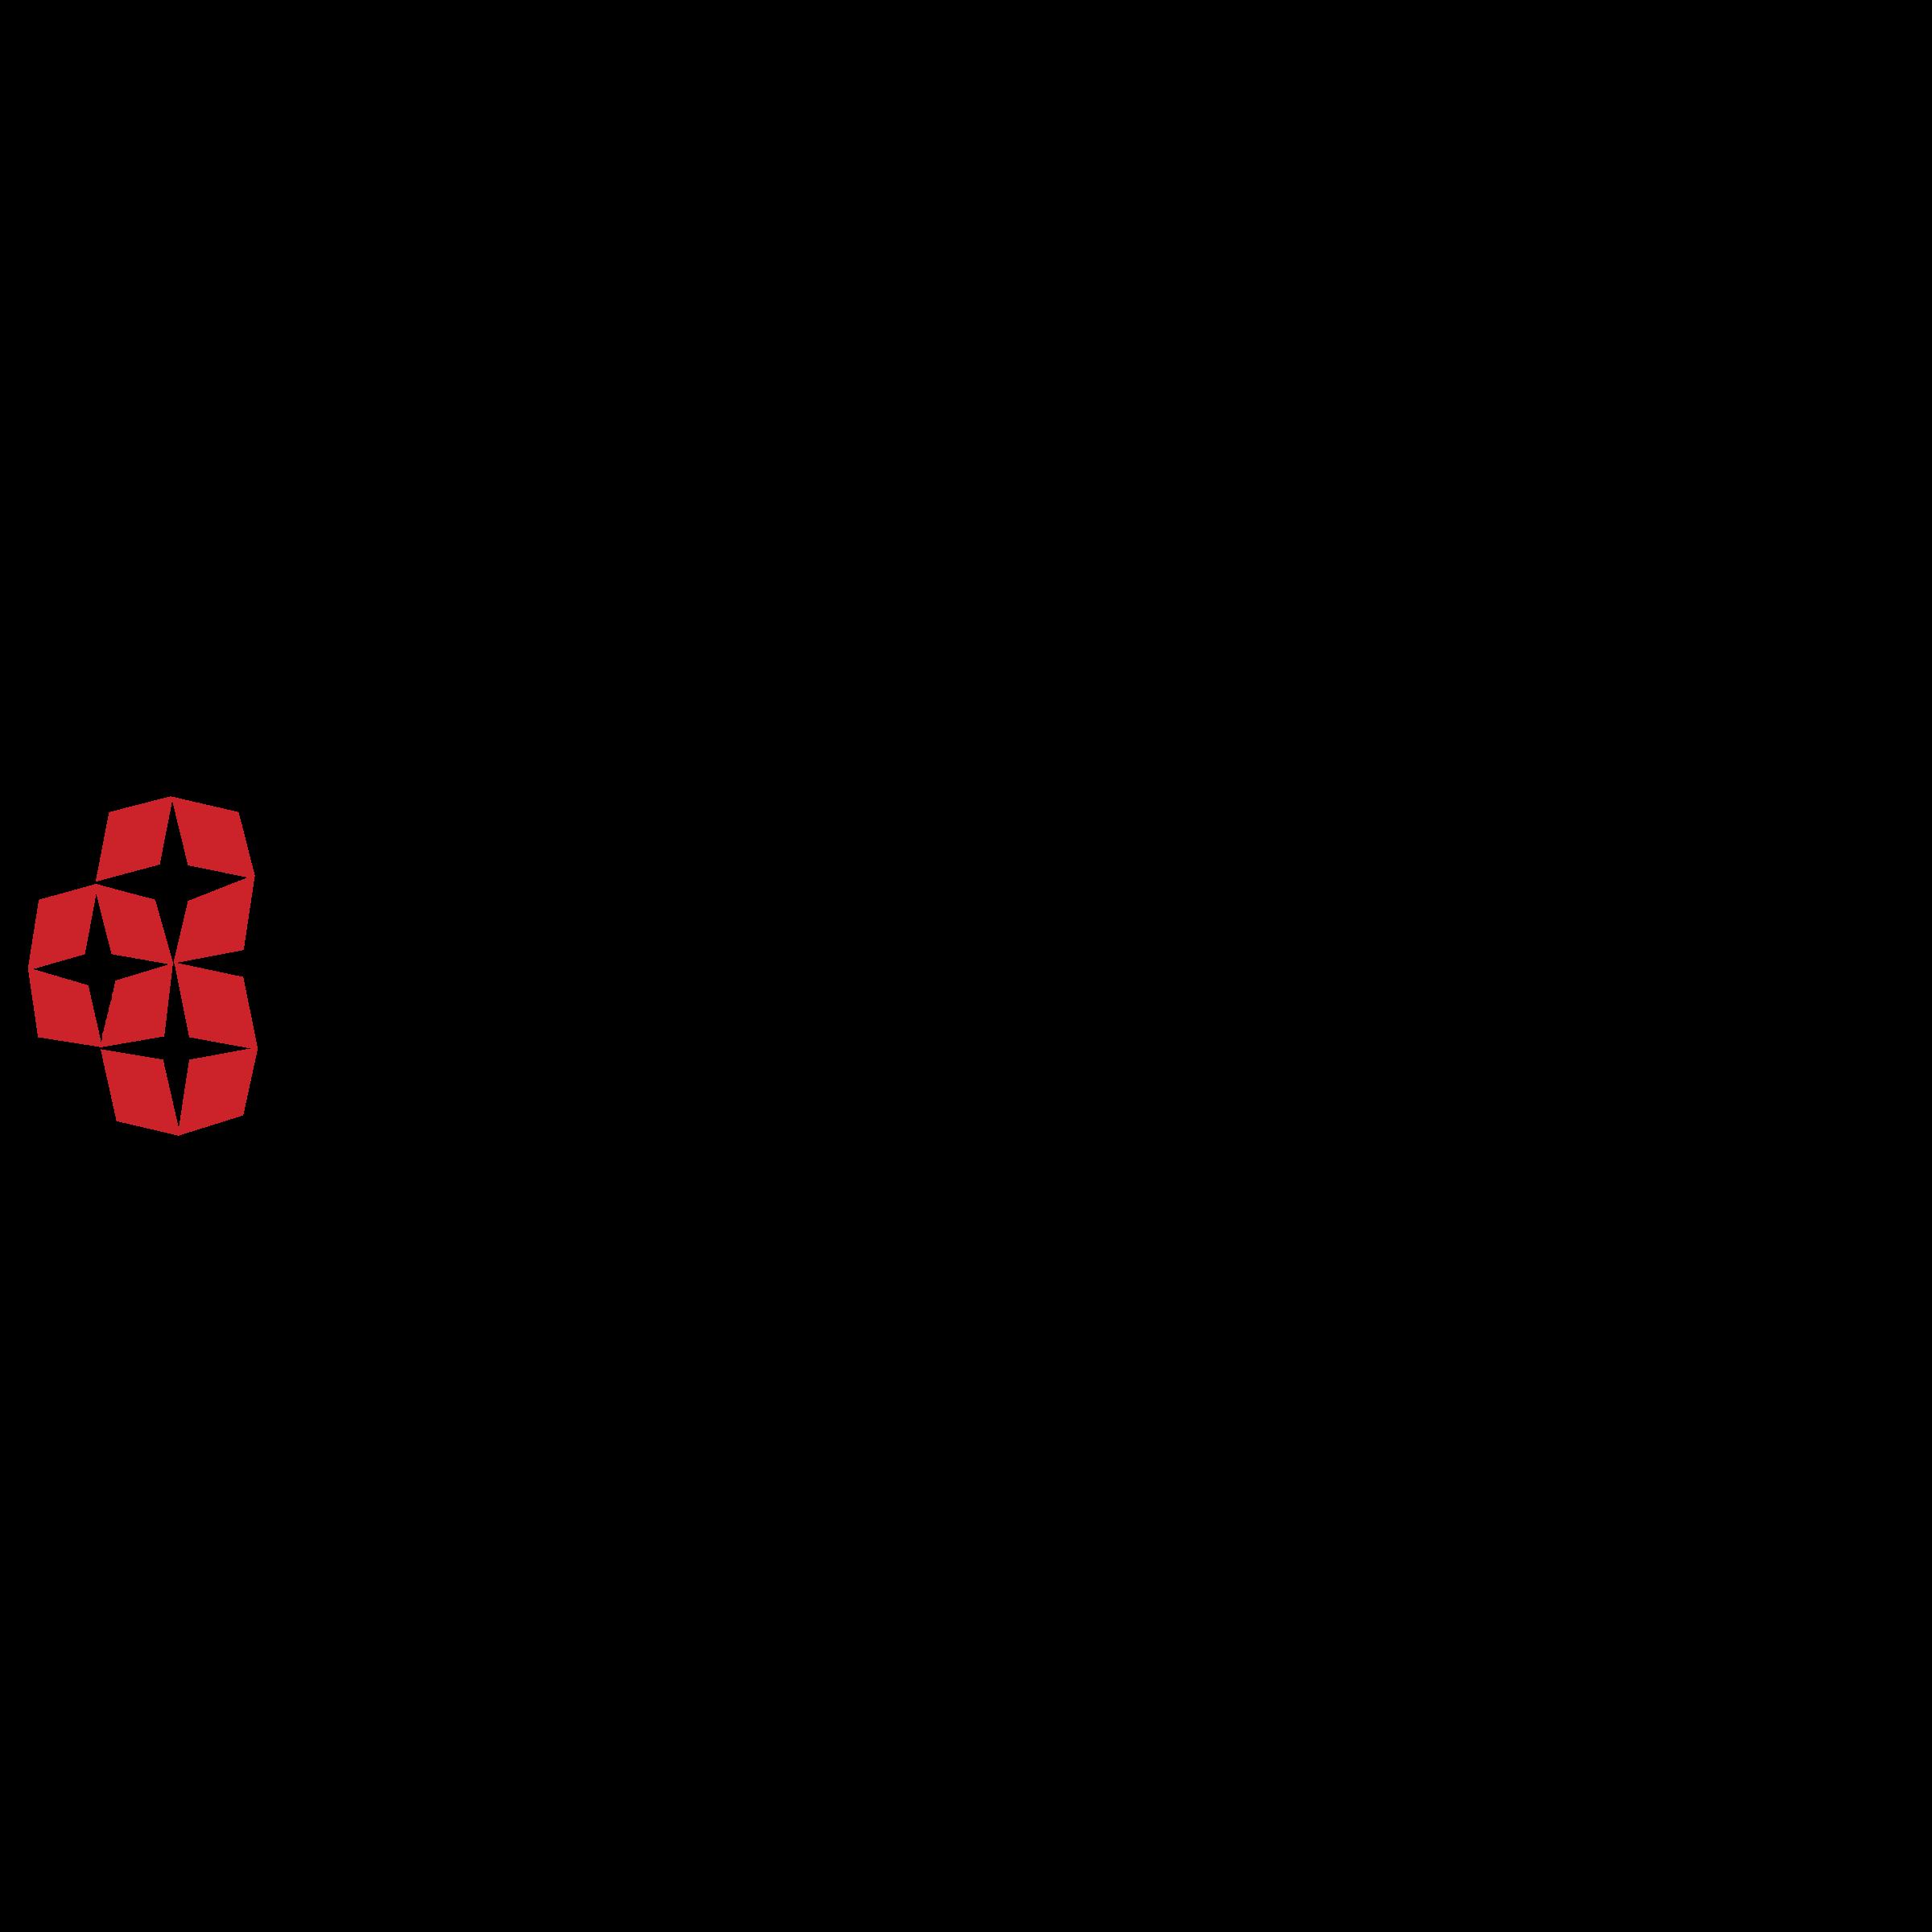 Samsung Logo PNG Transparent & SVG Vector - Freebie Supply